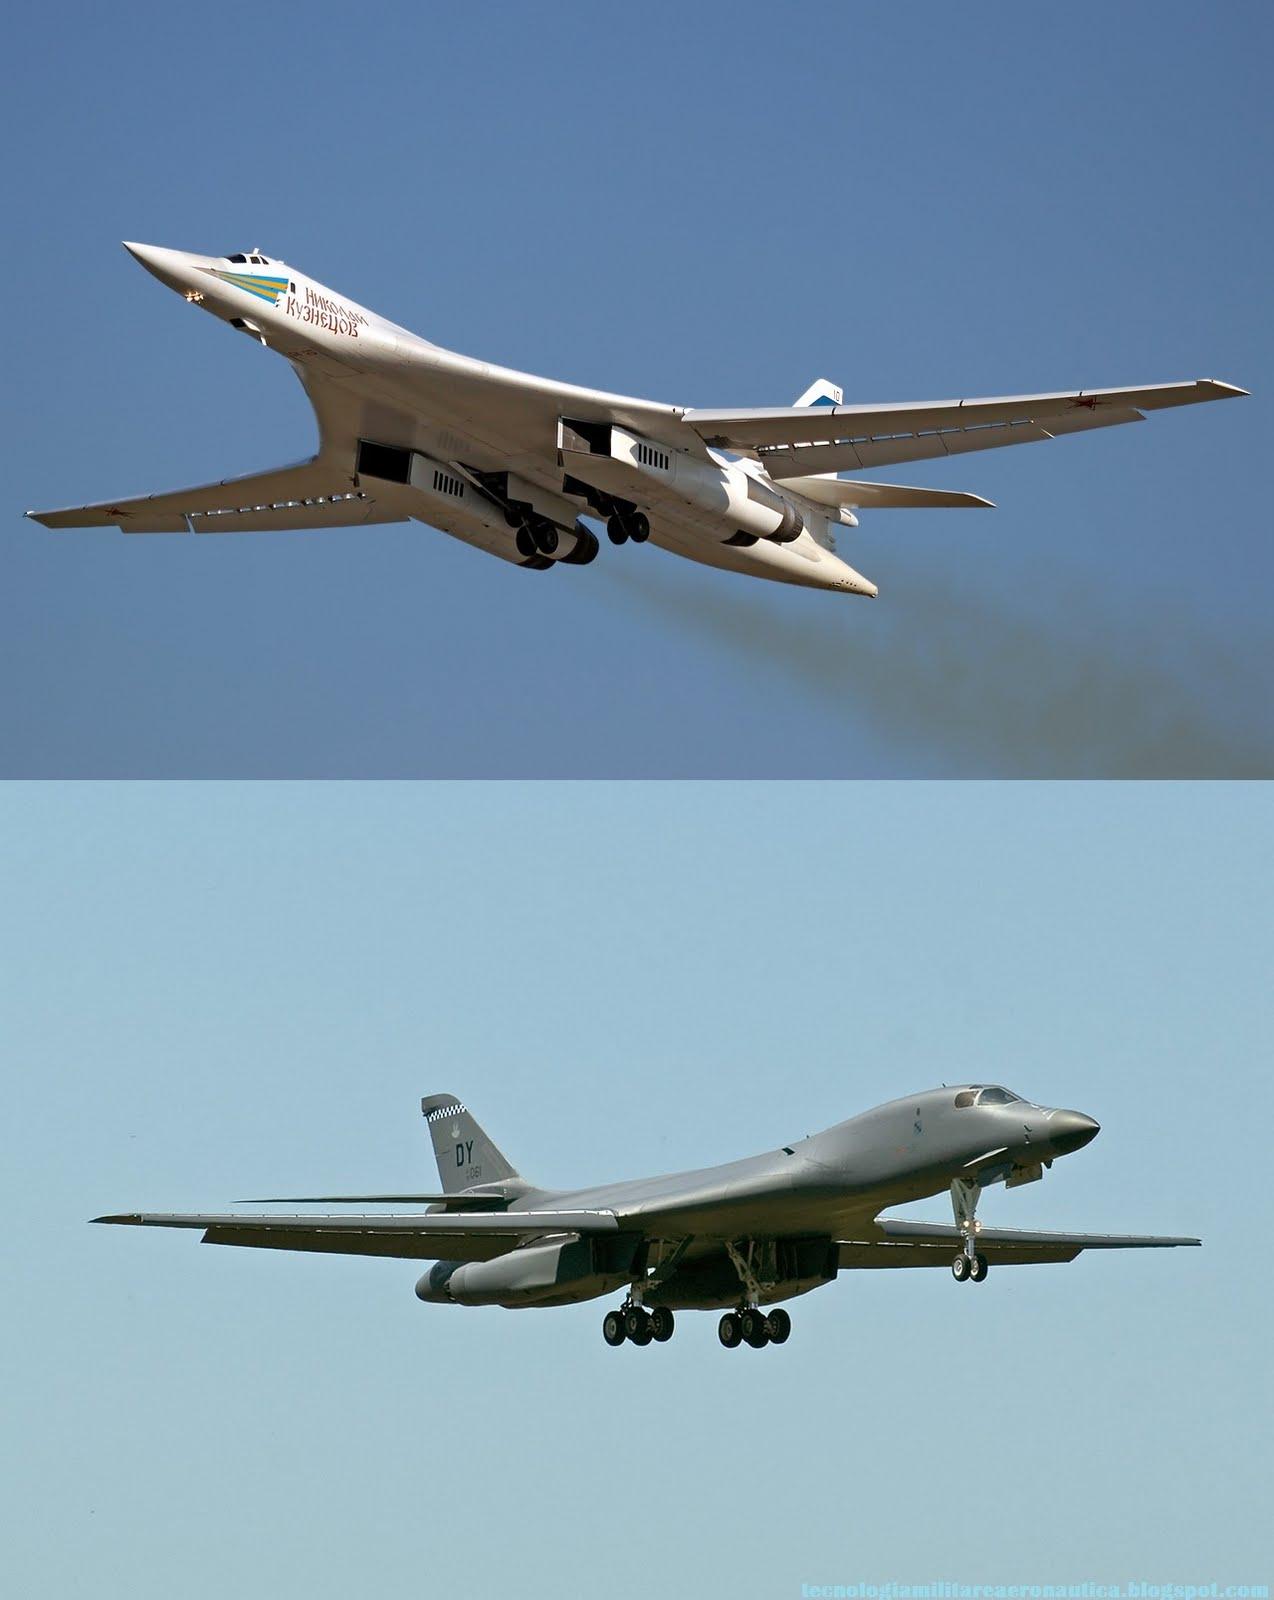 Poderío Militar: El modernizado bombardero ruso Tu-160 ... B1 Lancer Vs Tu 160